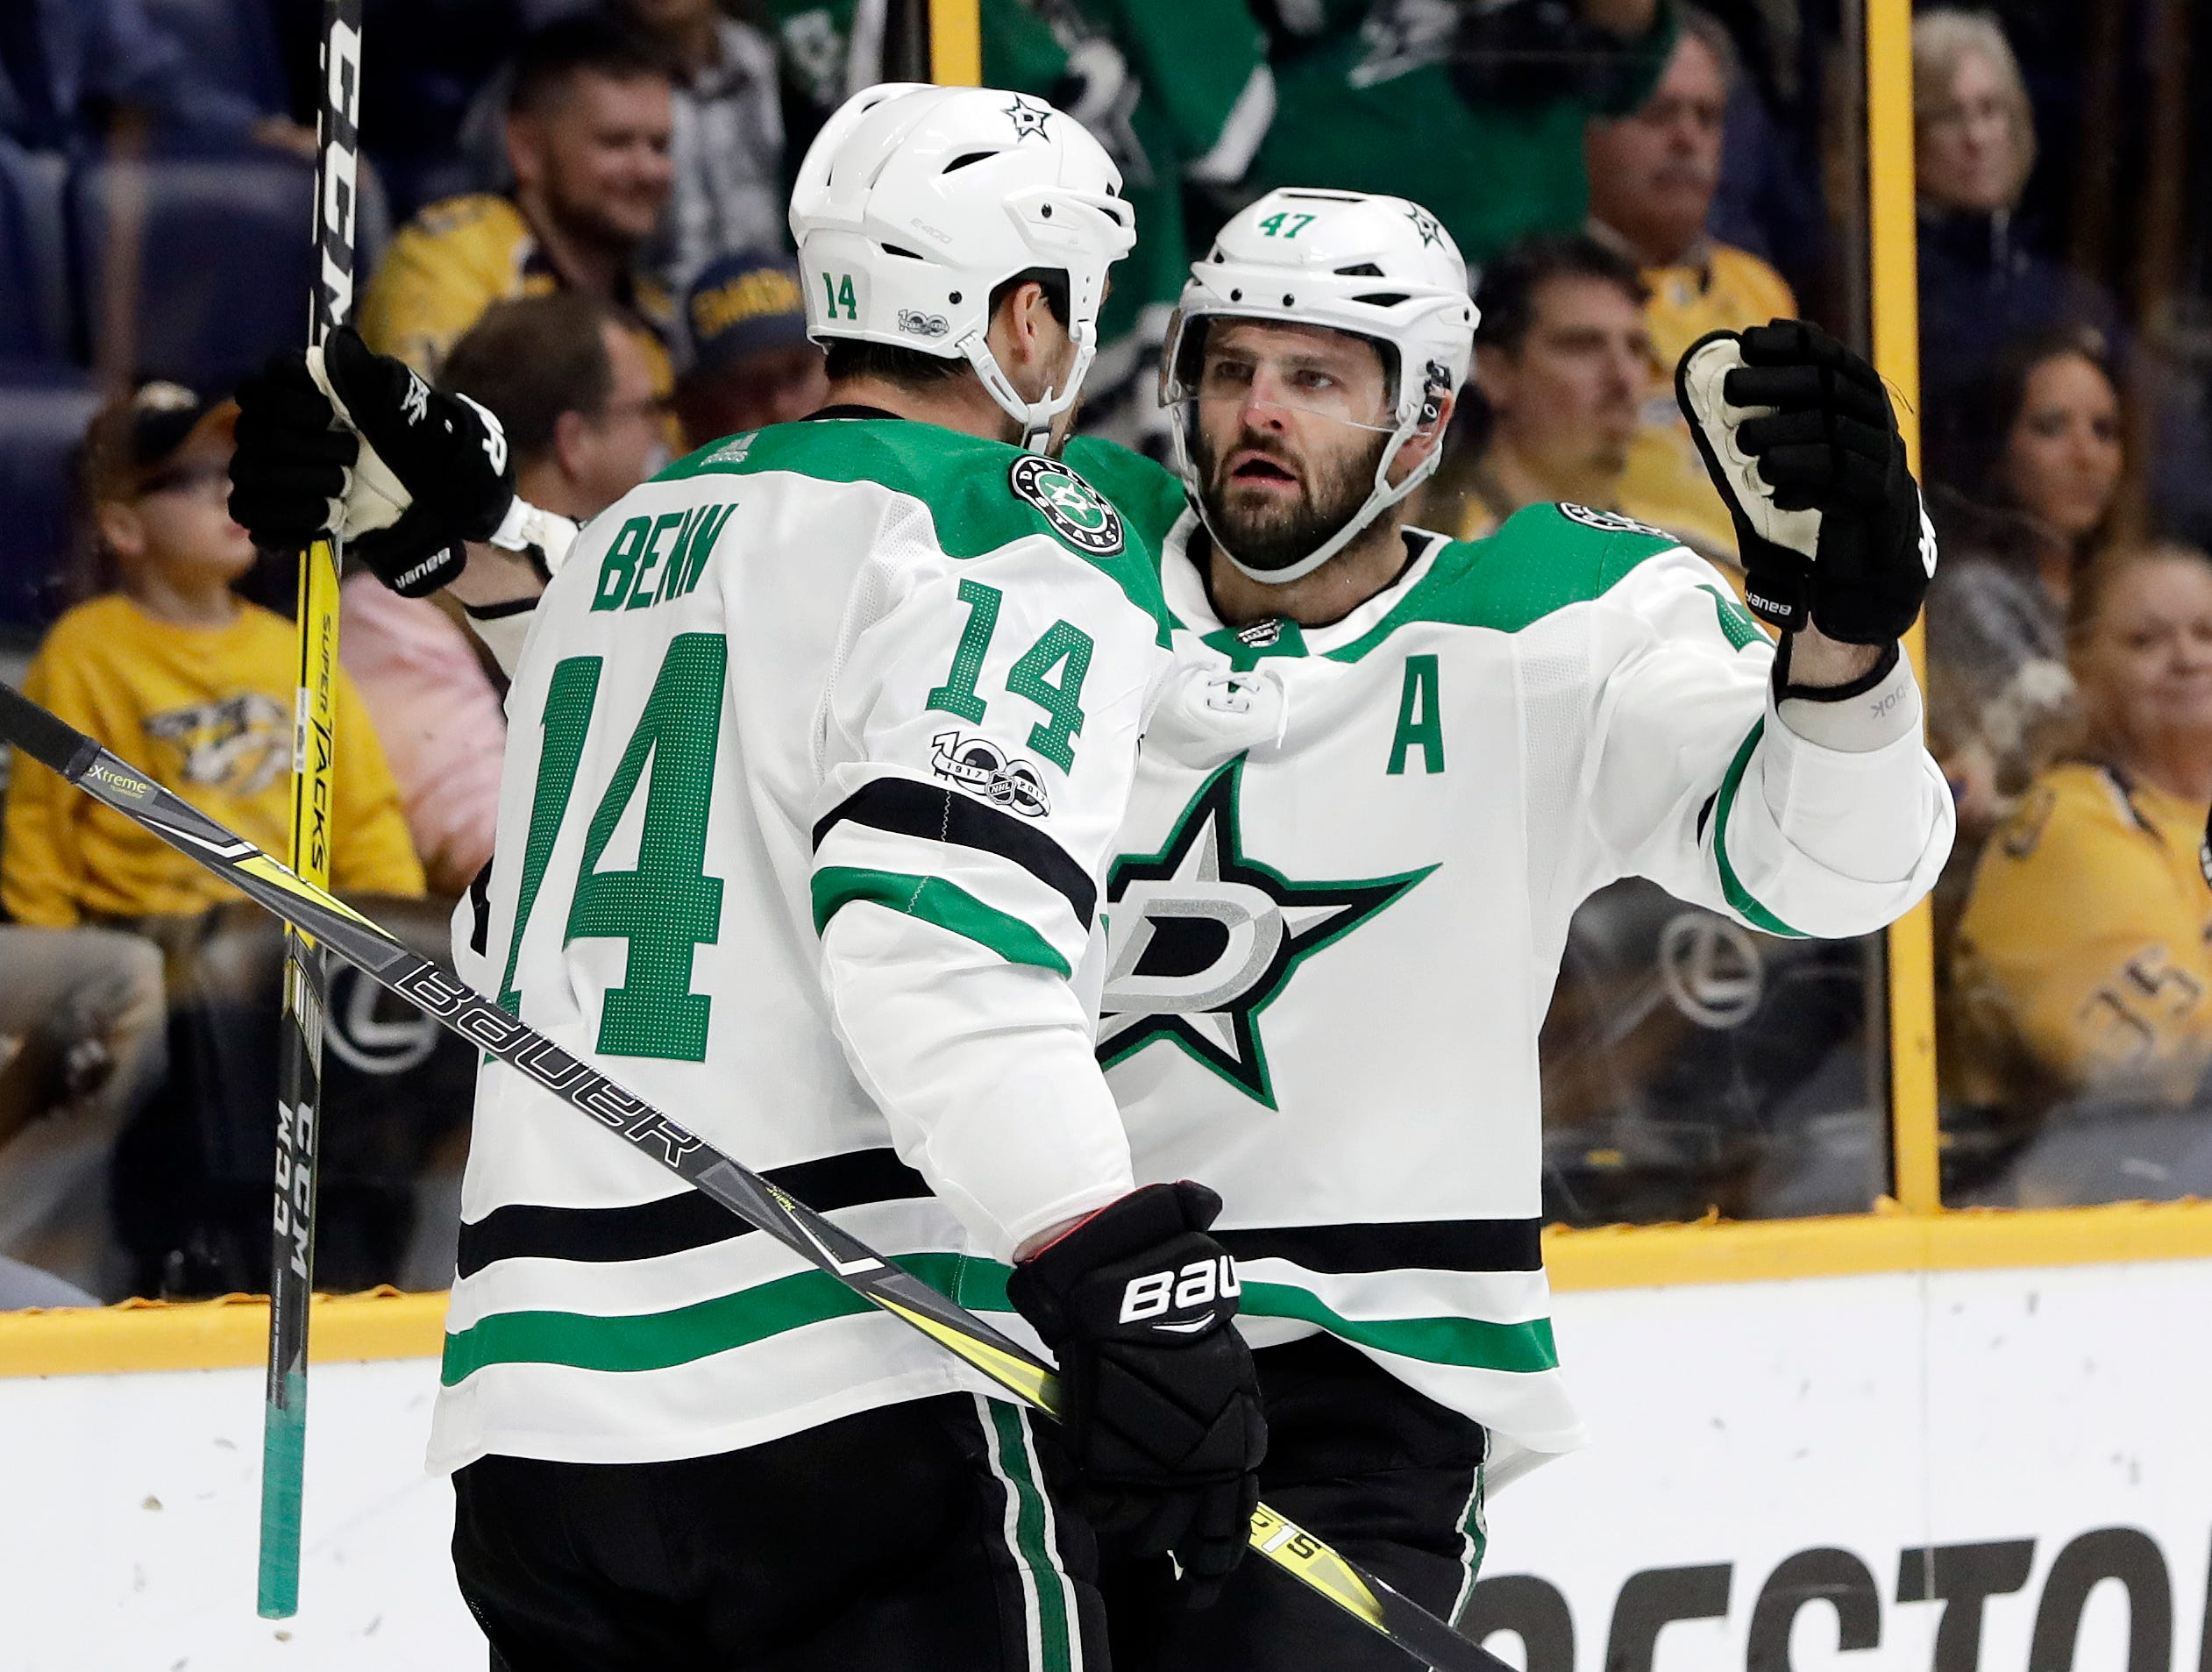 Girard gets first NHL goal, Predators beat Stars 4-1